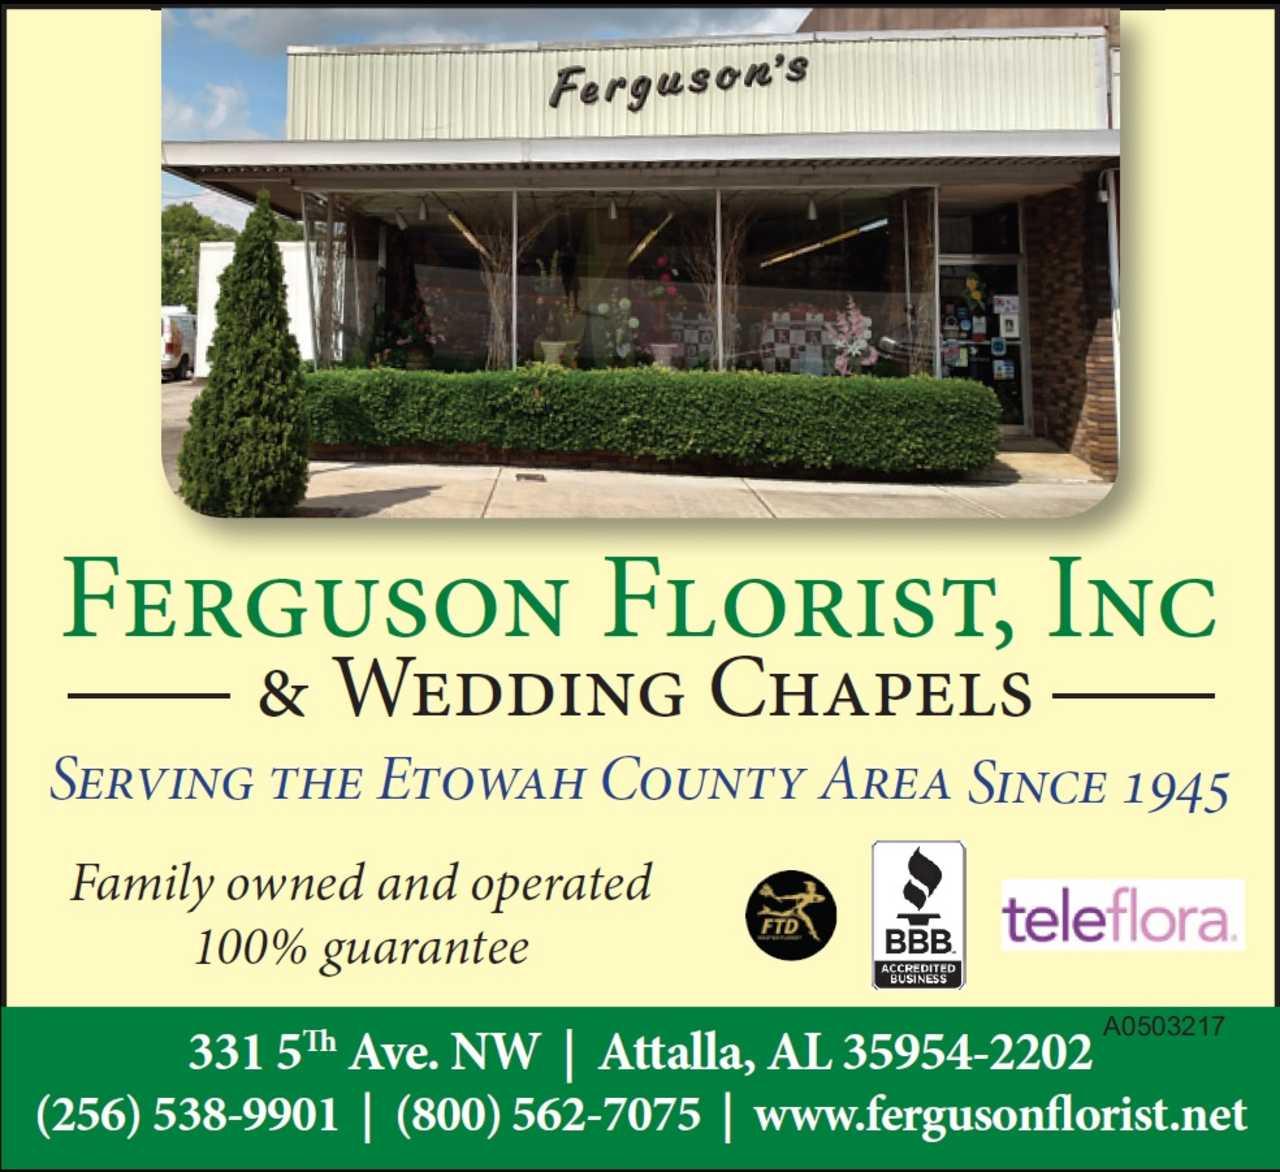 Ferguson Florist, Inc & Wedding Chapels - Shopping - Florists in Attalla AL